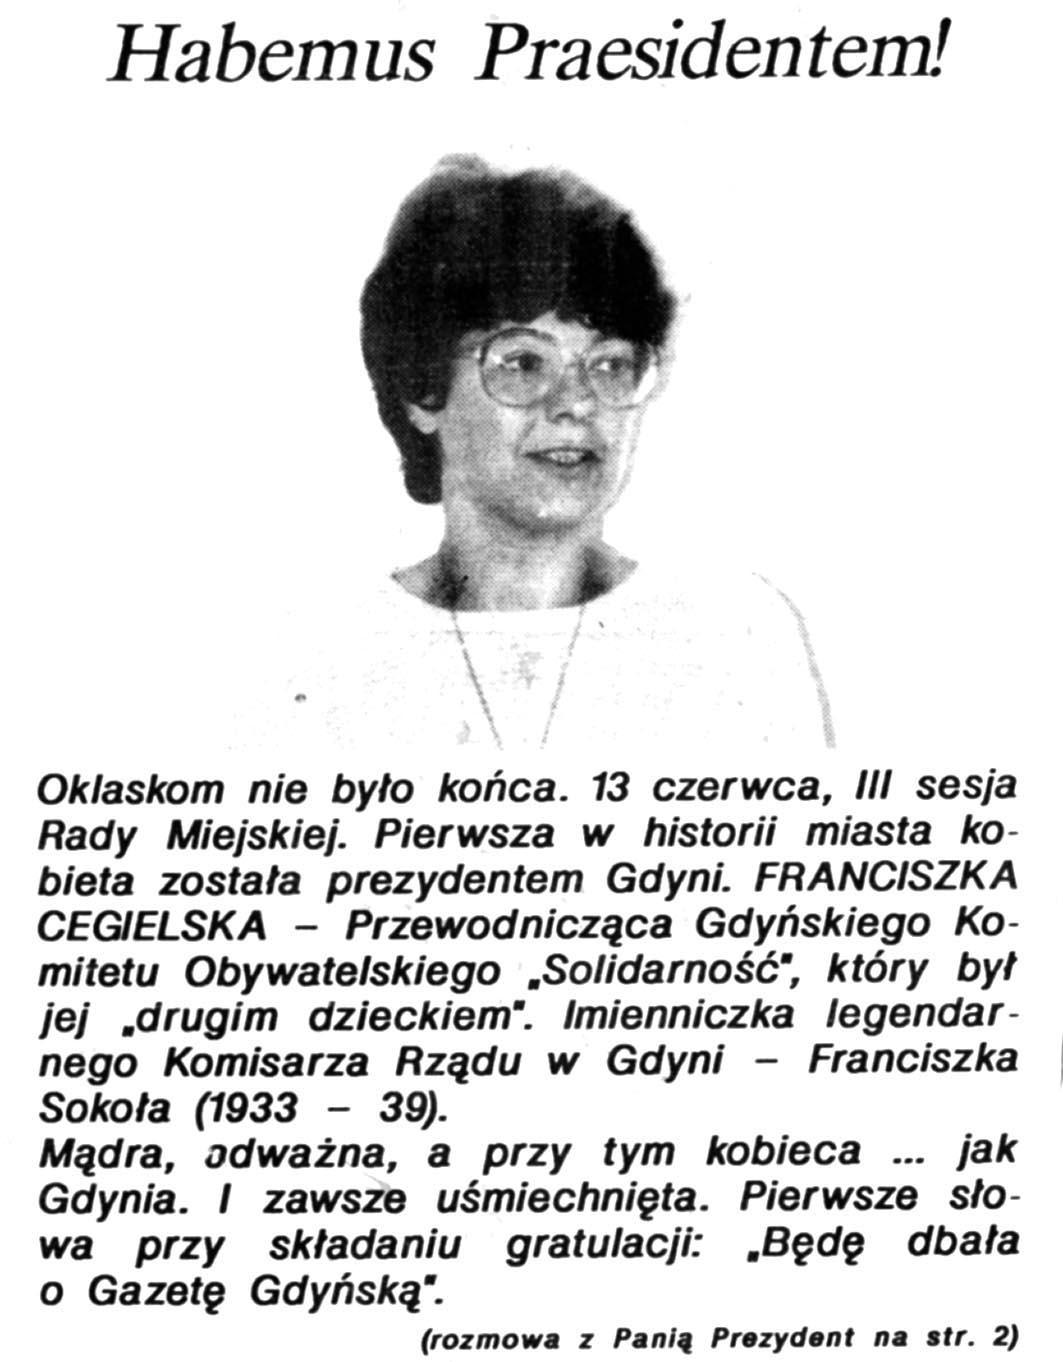 Habemus Praesidentem! // Gazeta Gdyńska. - 1990, nr 12, s. [1]